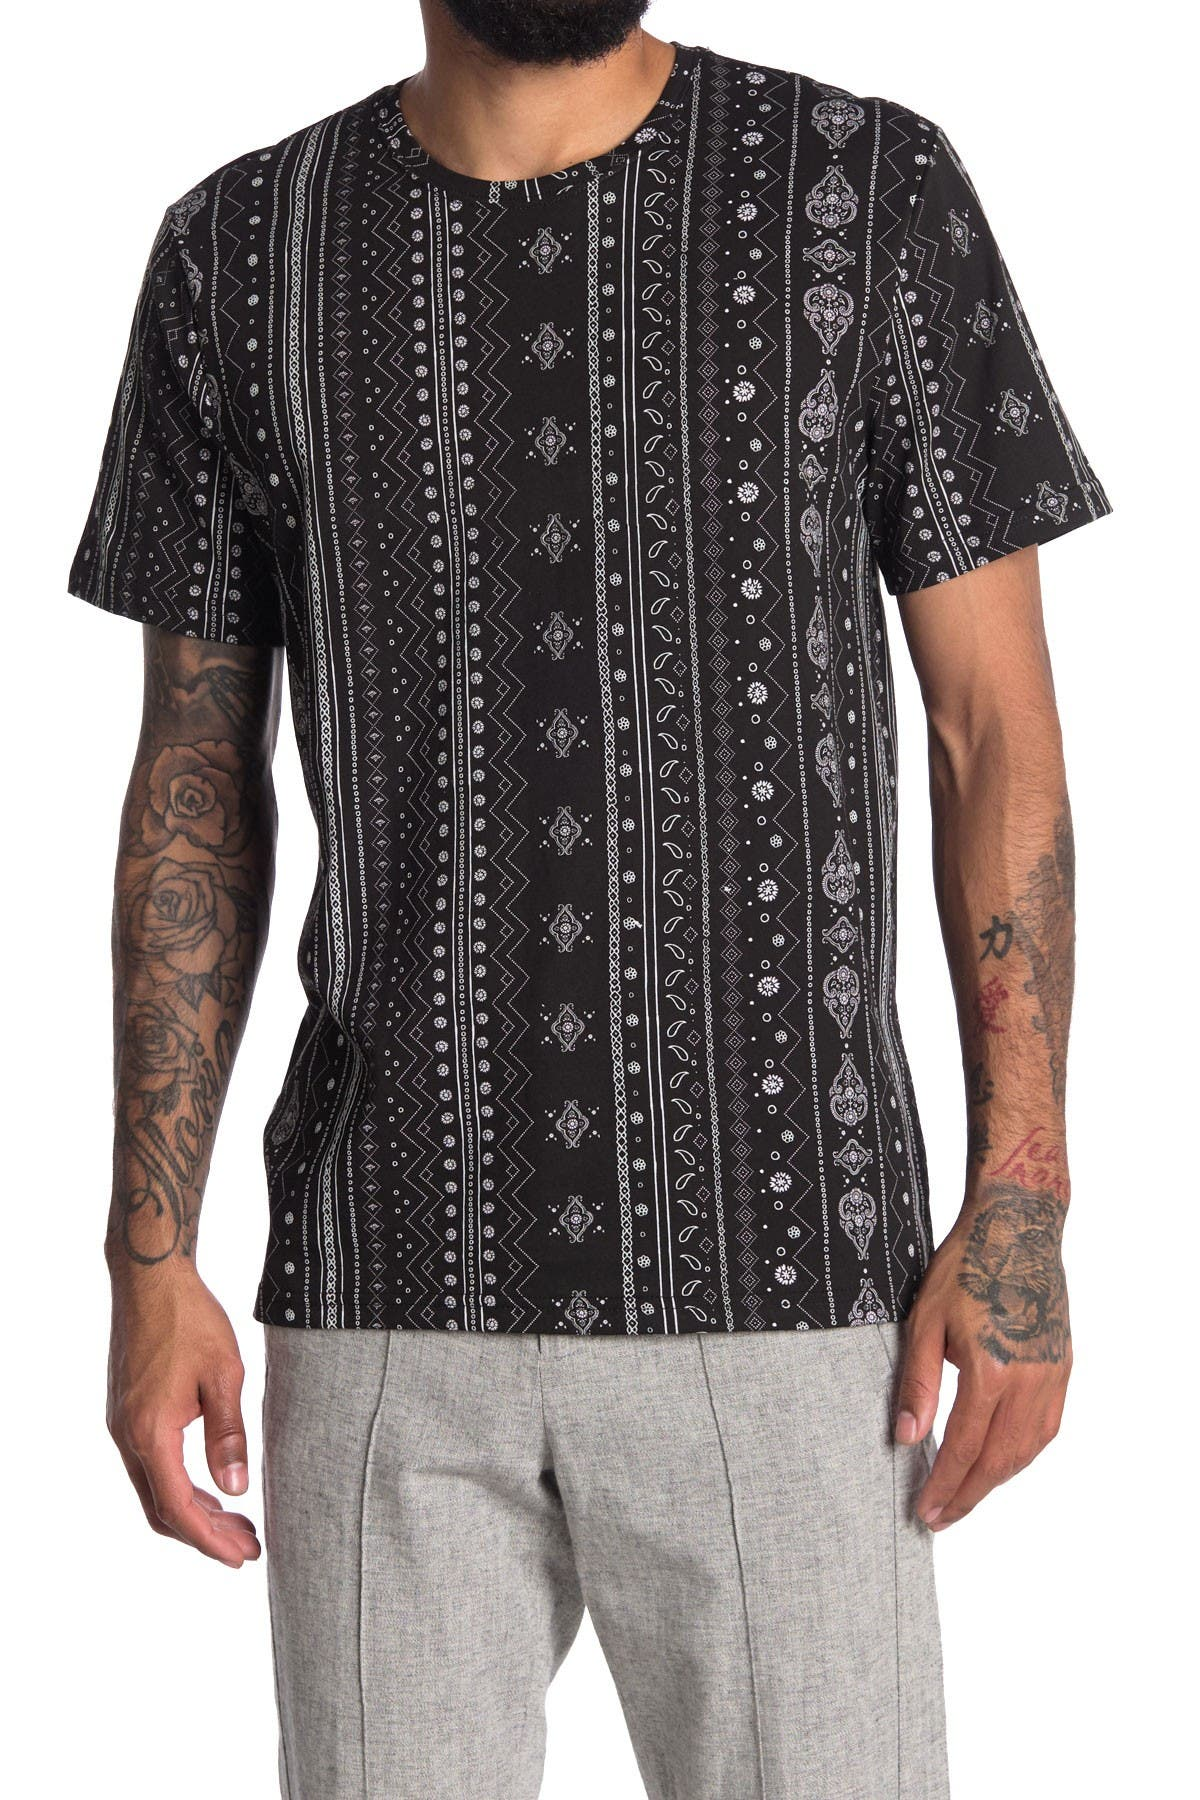 Image of Abound Printed Crew Neck Short Sleeve Shirt